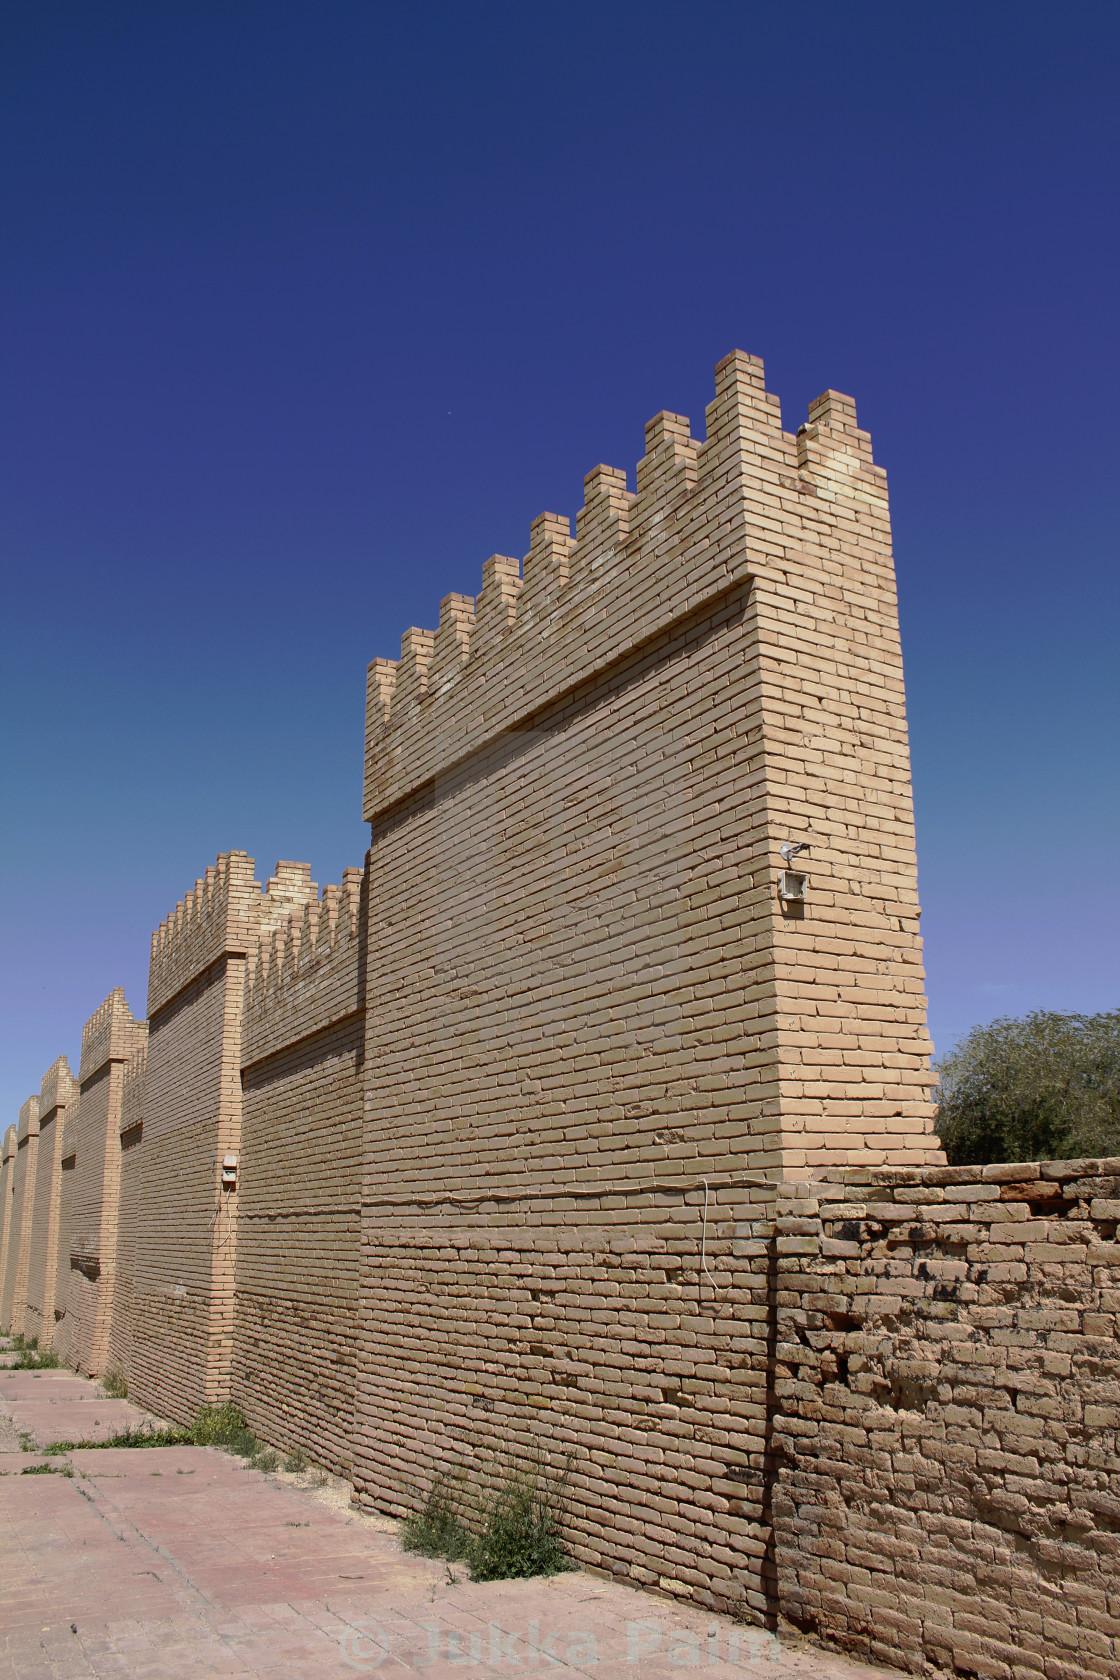 Former saddam hussein palace ruins, babylon iraq stock image.